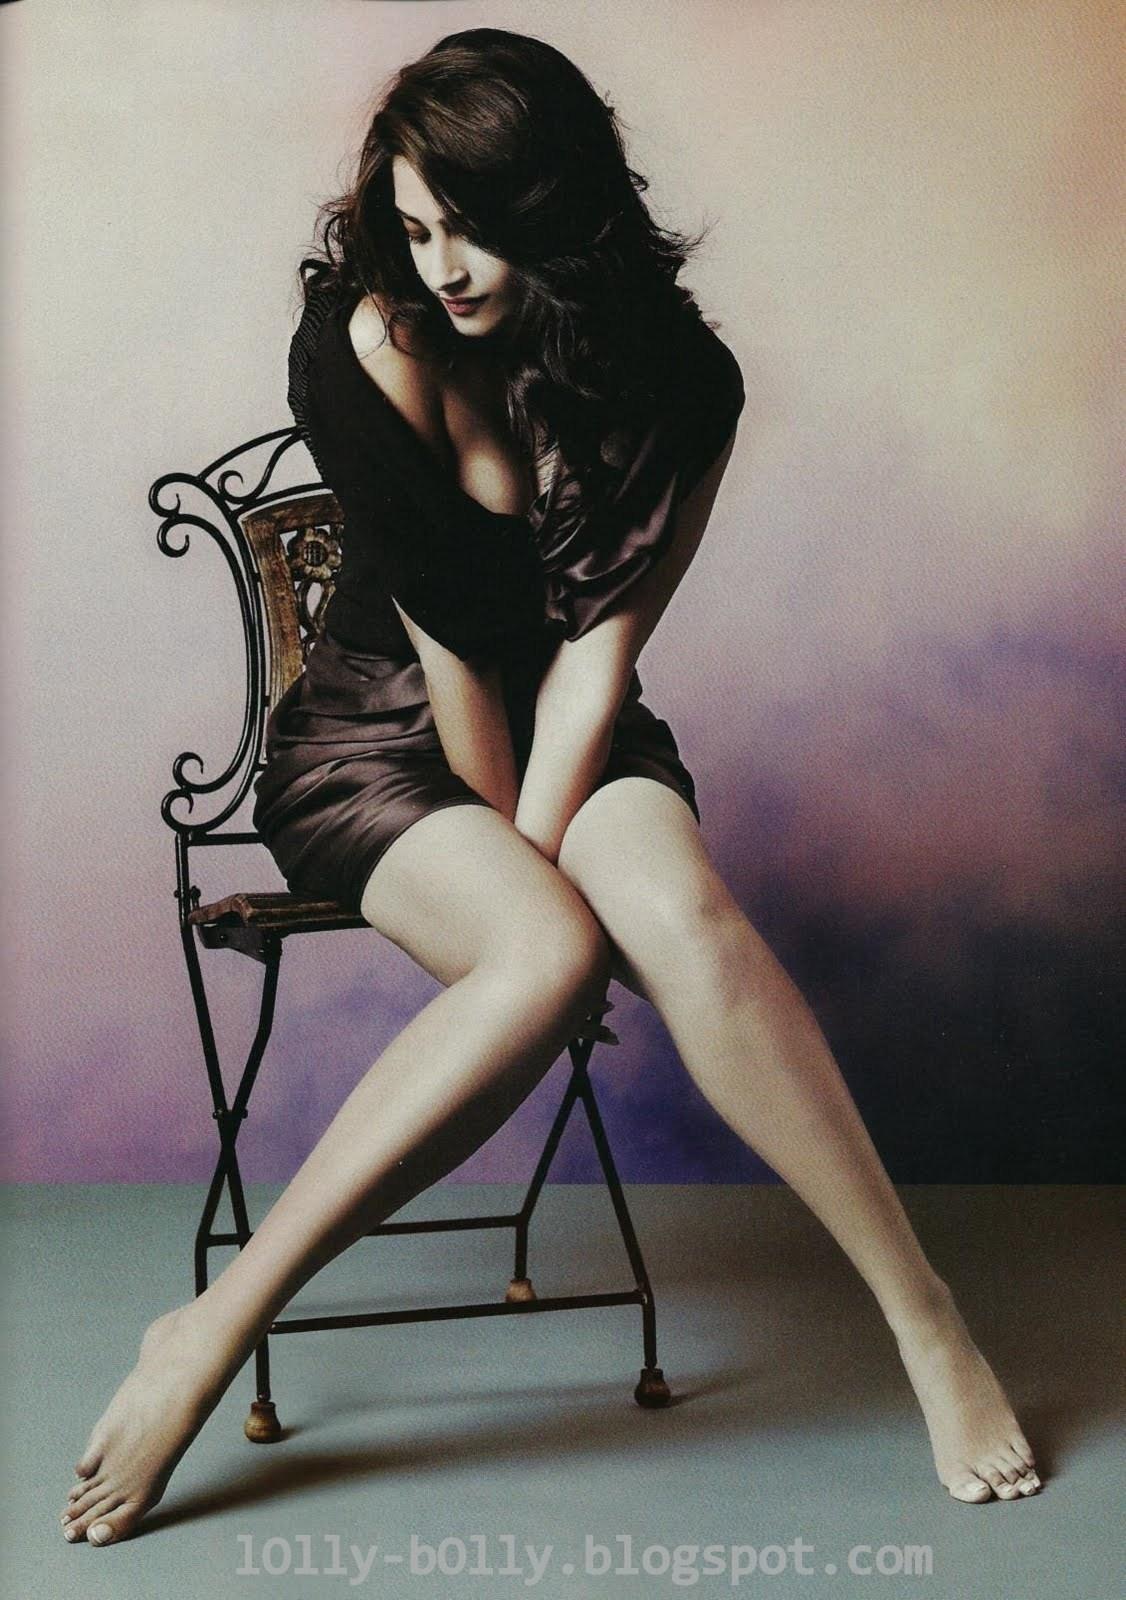 Sonam Kapoor Unseen Hottest Bikini Pictures Gallery -1506